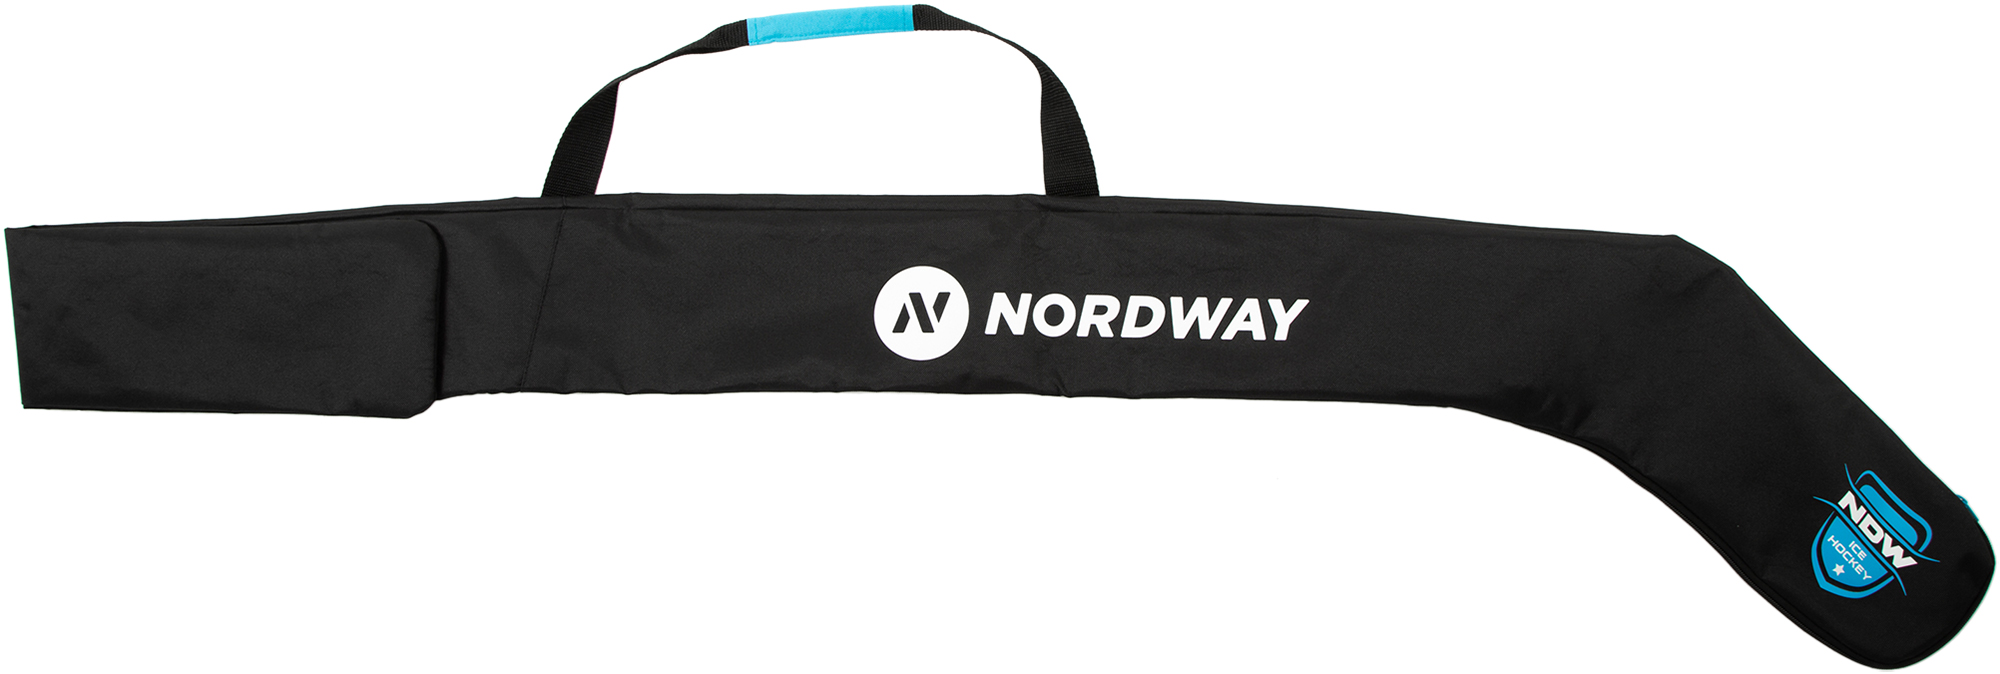 Nordway Чехол для клюшек